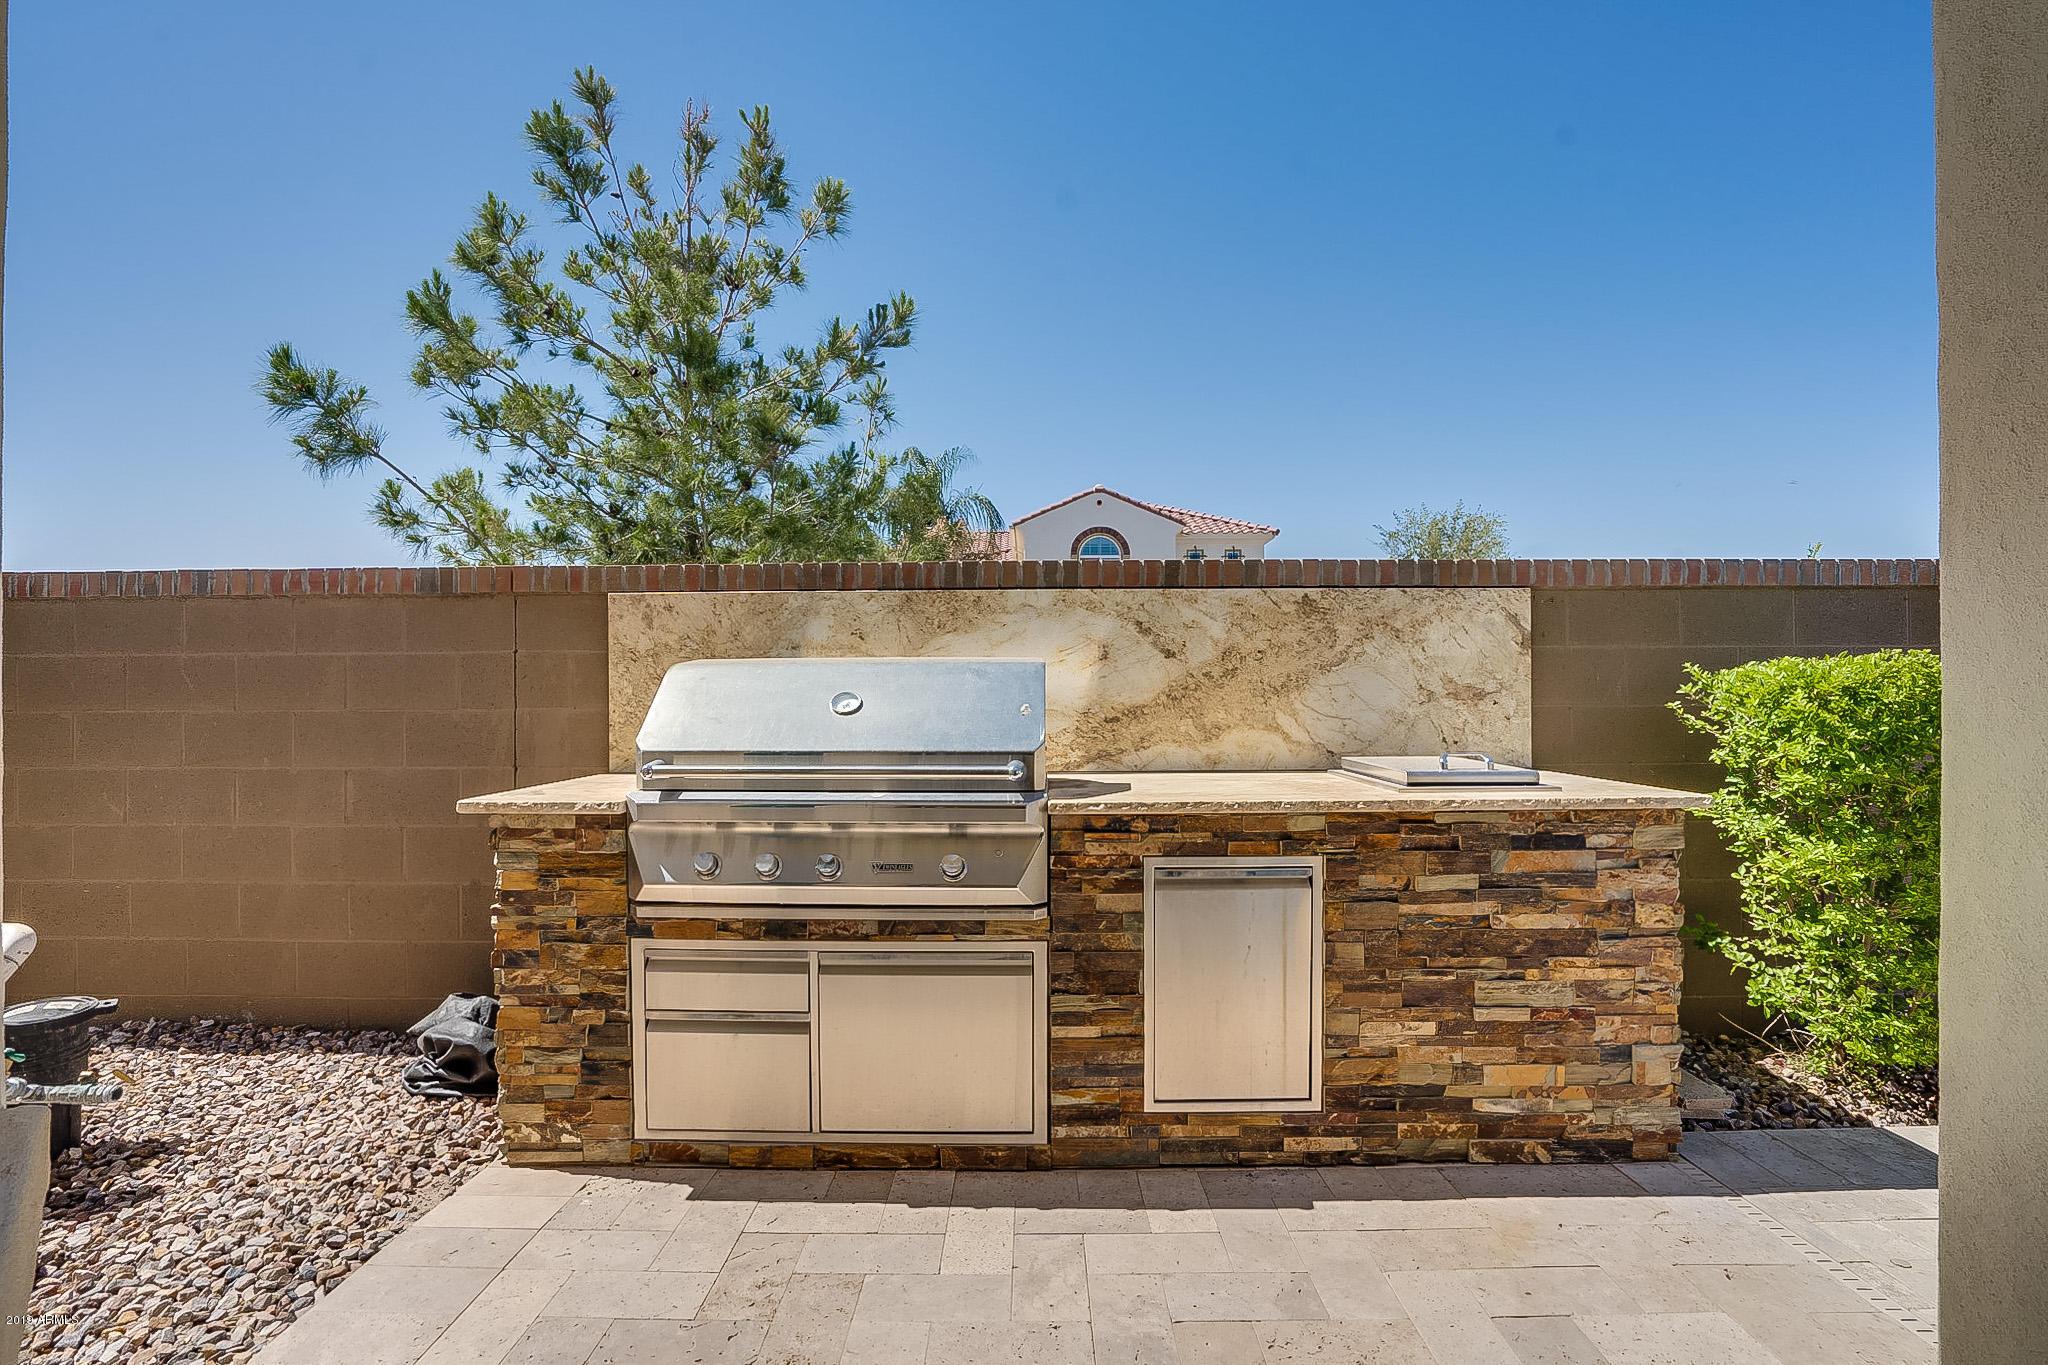 MLS 5921054 3324 S IVY Way, Chandler, AZ 85248 Guest House